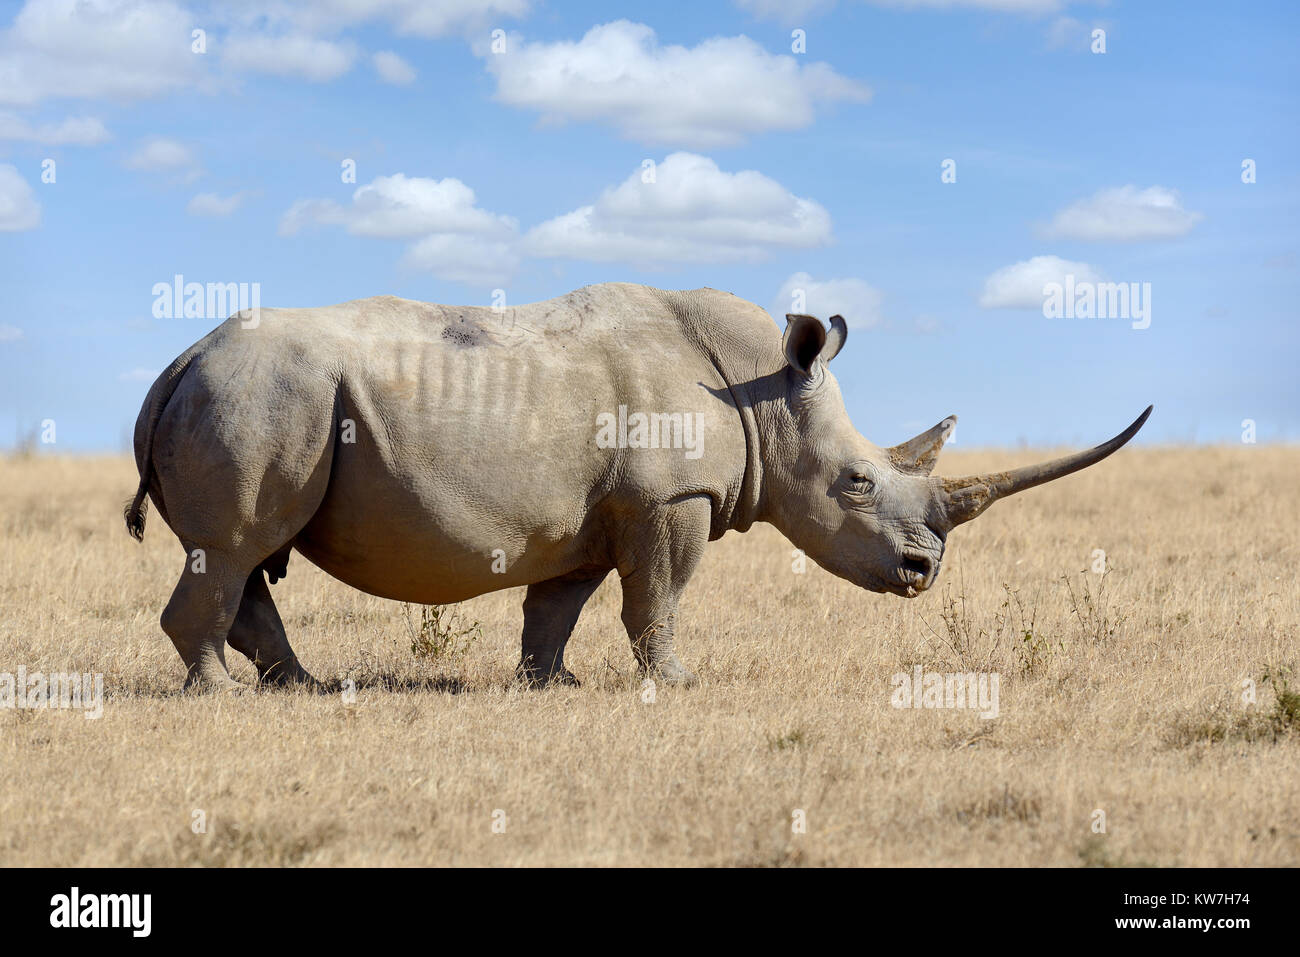 African white rhino, parco nazionale del Kenya, Africa Immagini Stock